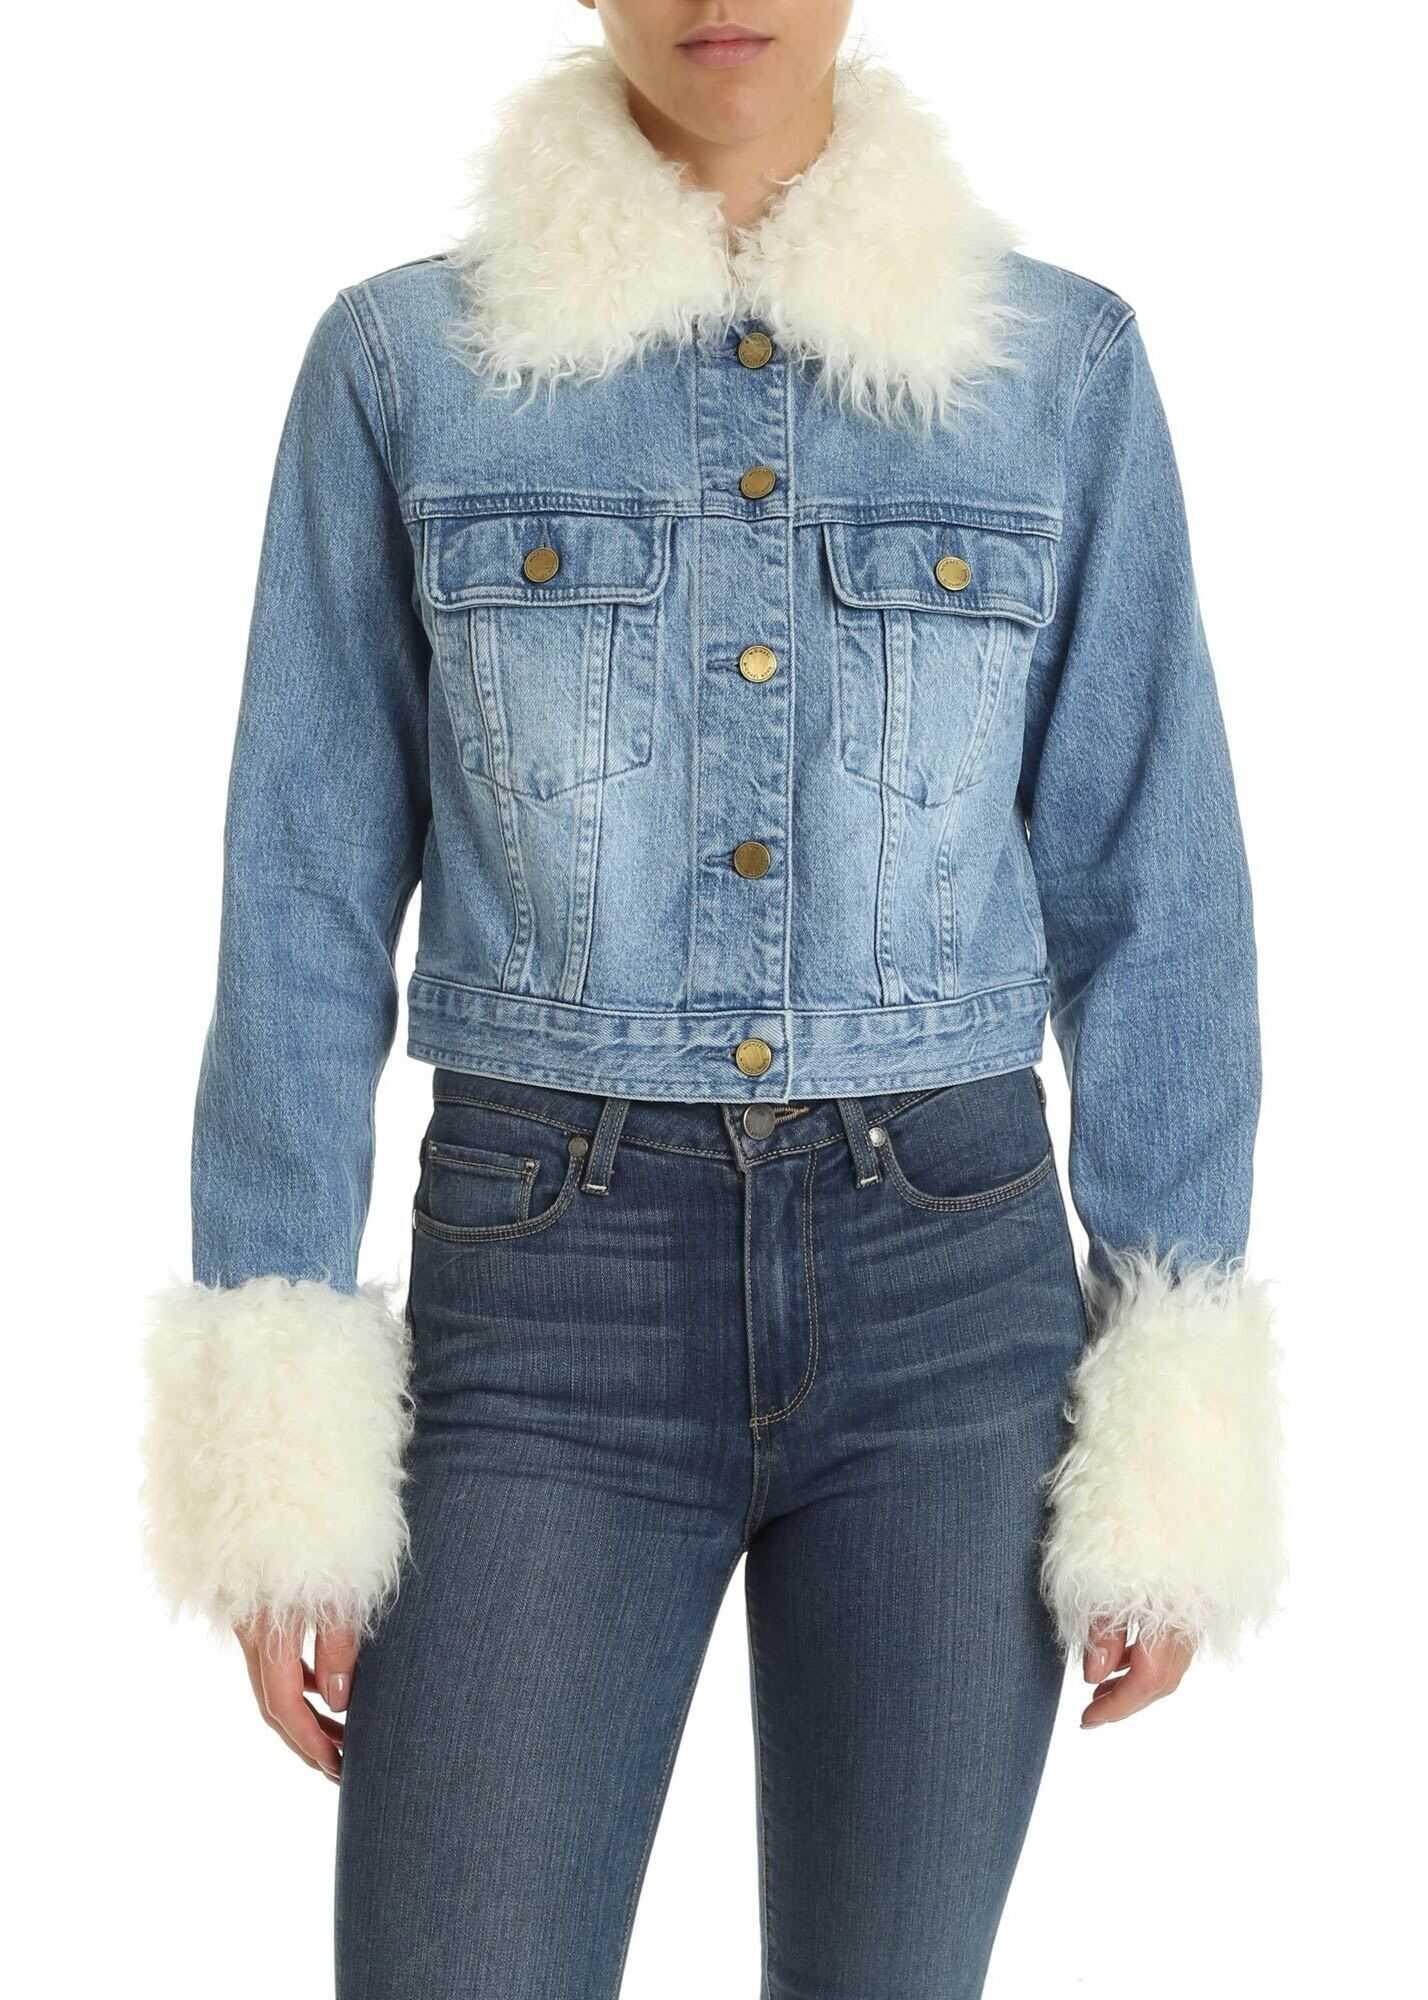 Michael Kors Light Blue Jacket With Eco-Fur Details Light Blue